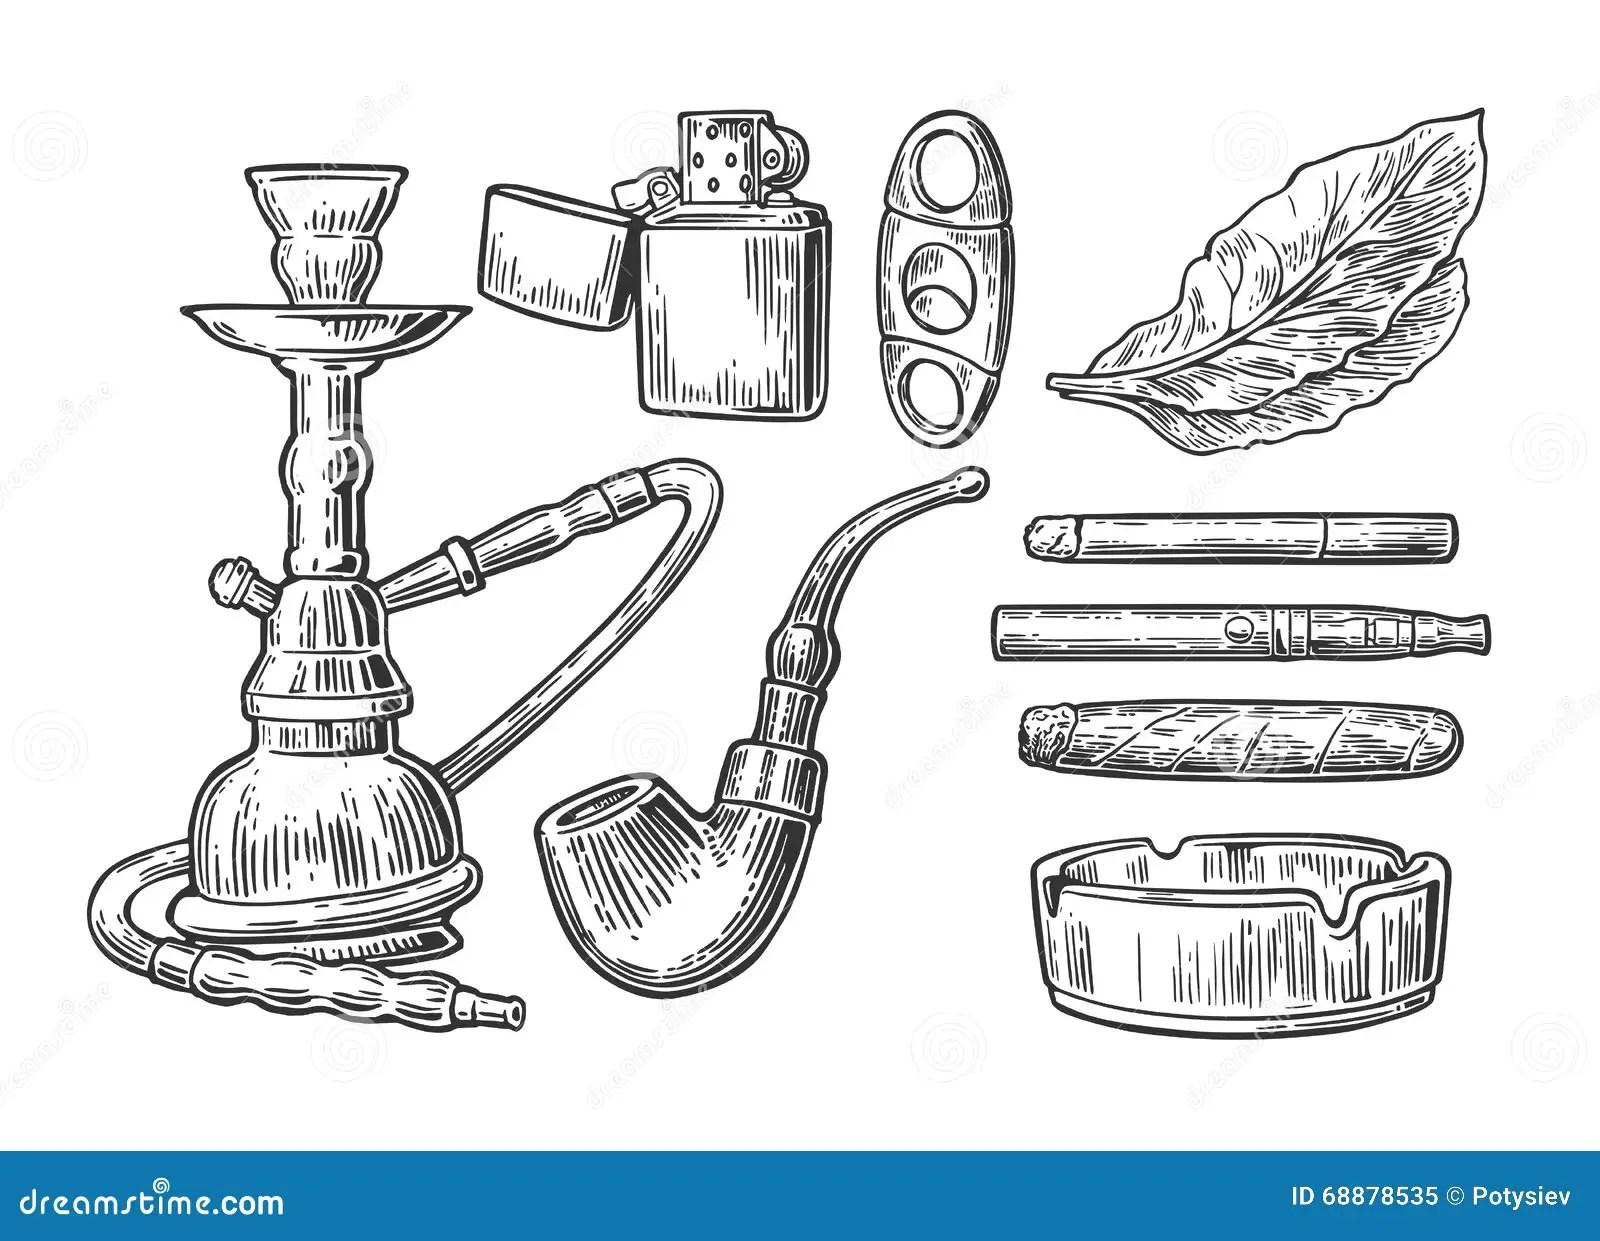 Smoking Cigar In An Ashtray Royalty Free Stock Image